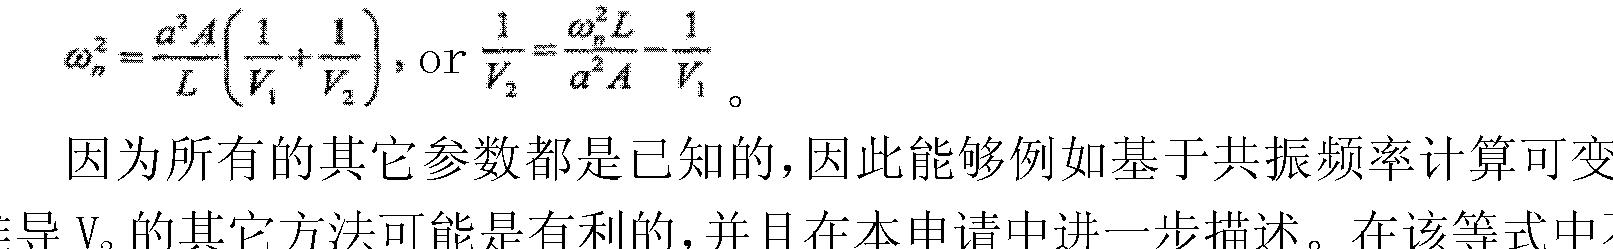 Figure CN102512725AD00243